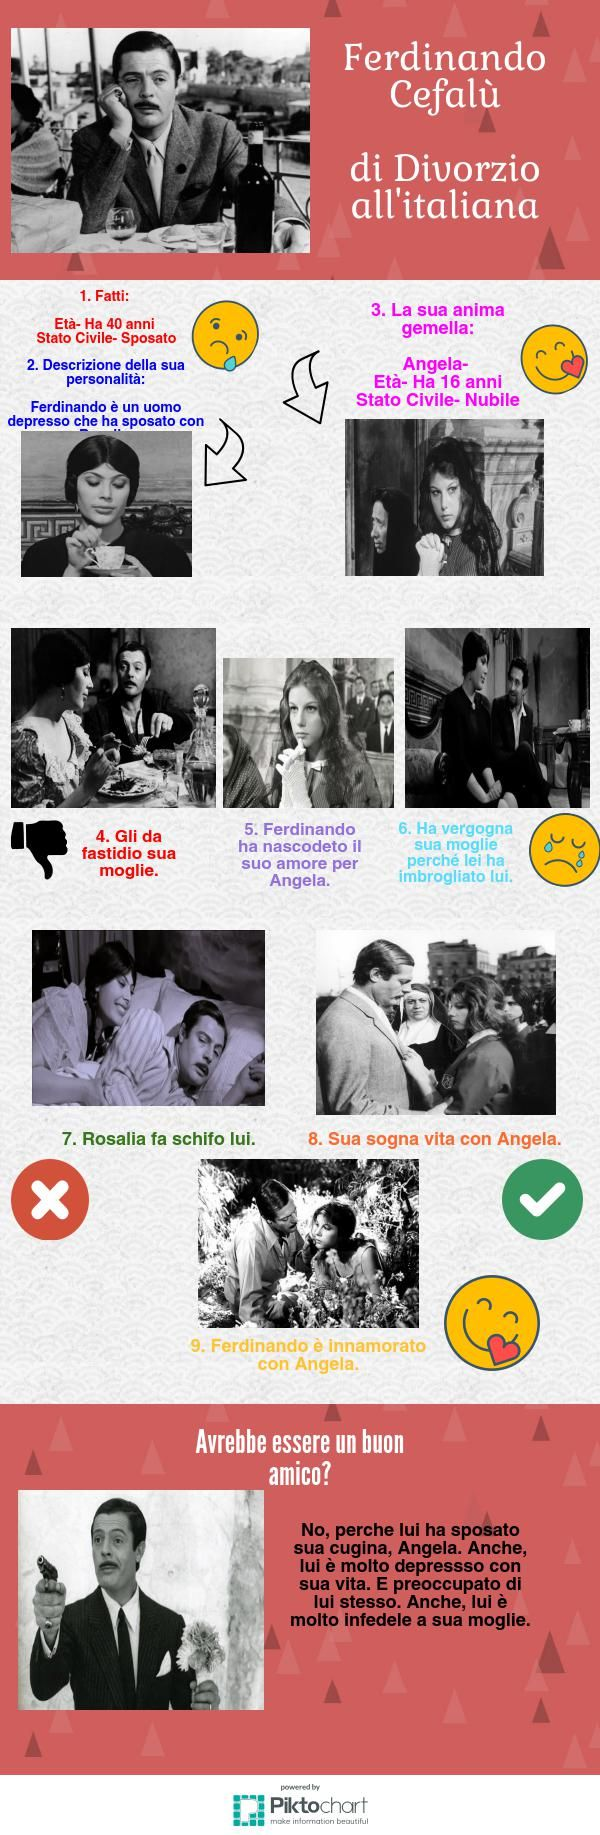 Divorzio all'italiana priya m | Piktochart Infographic Editor